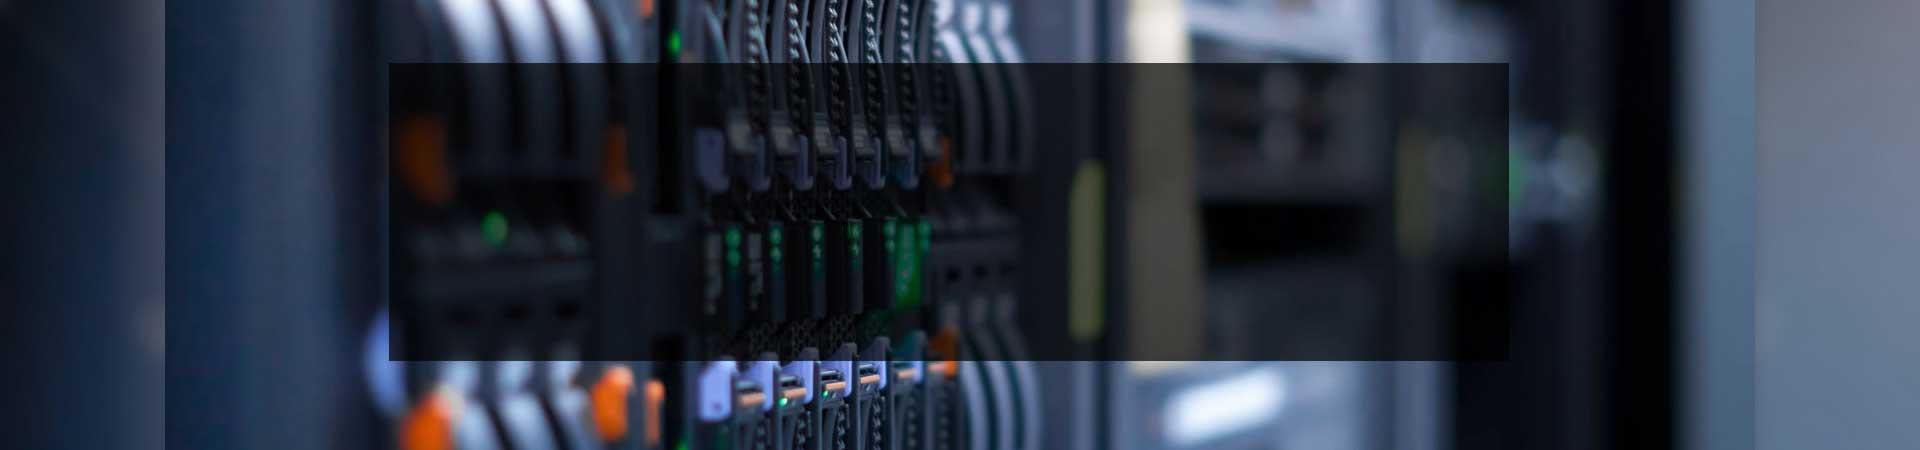 Web Hosting in bd